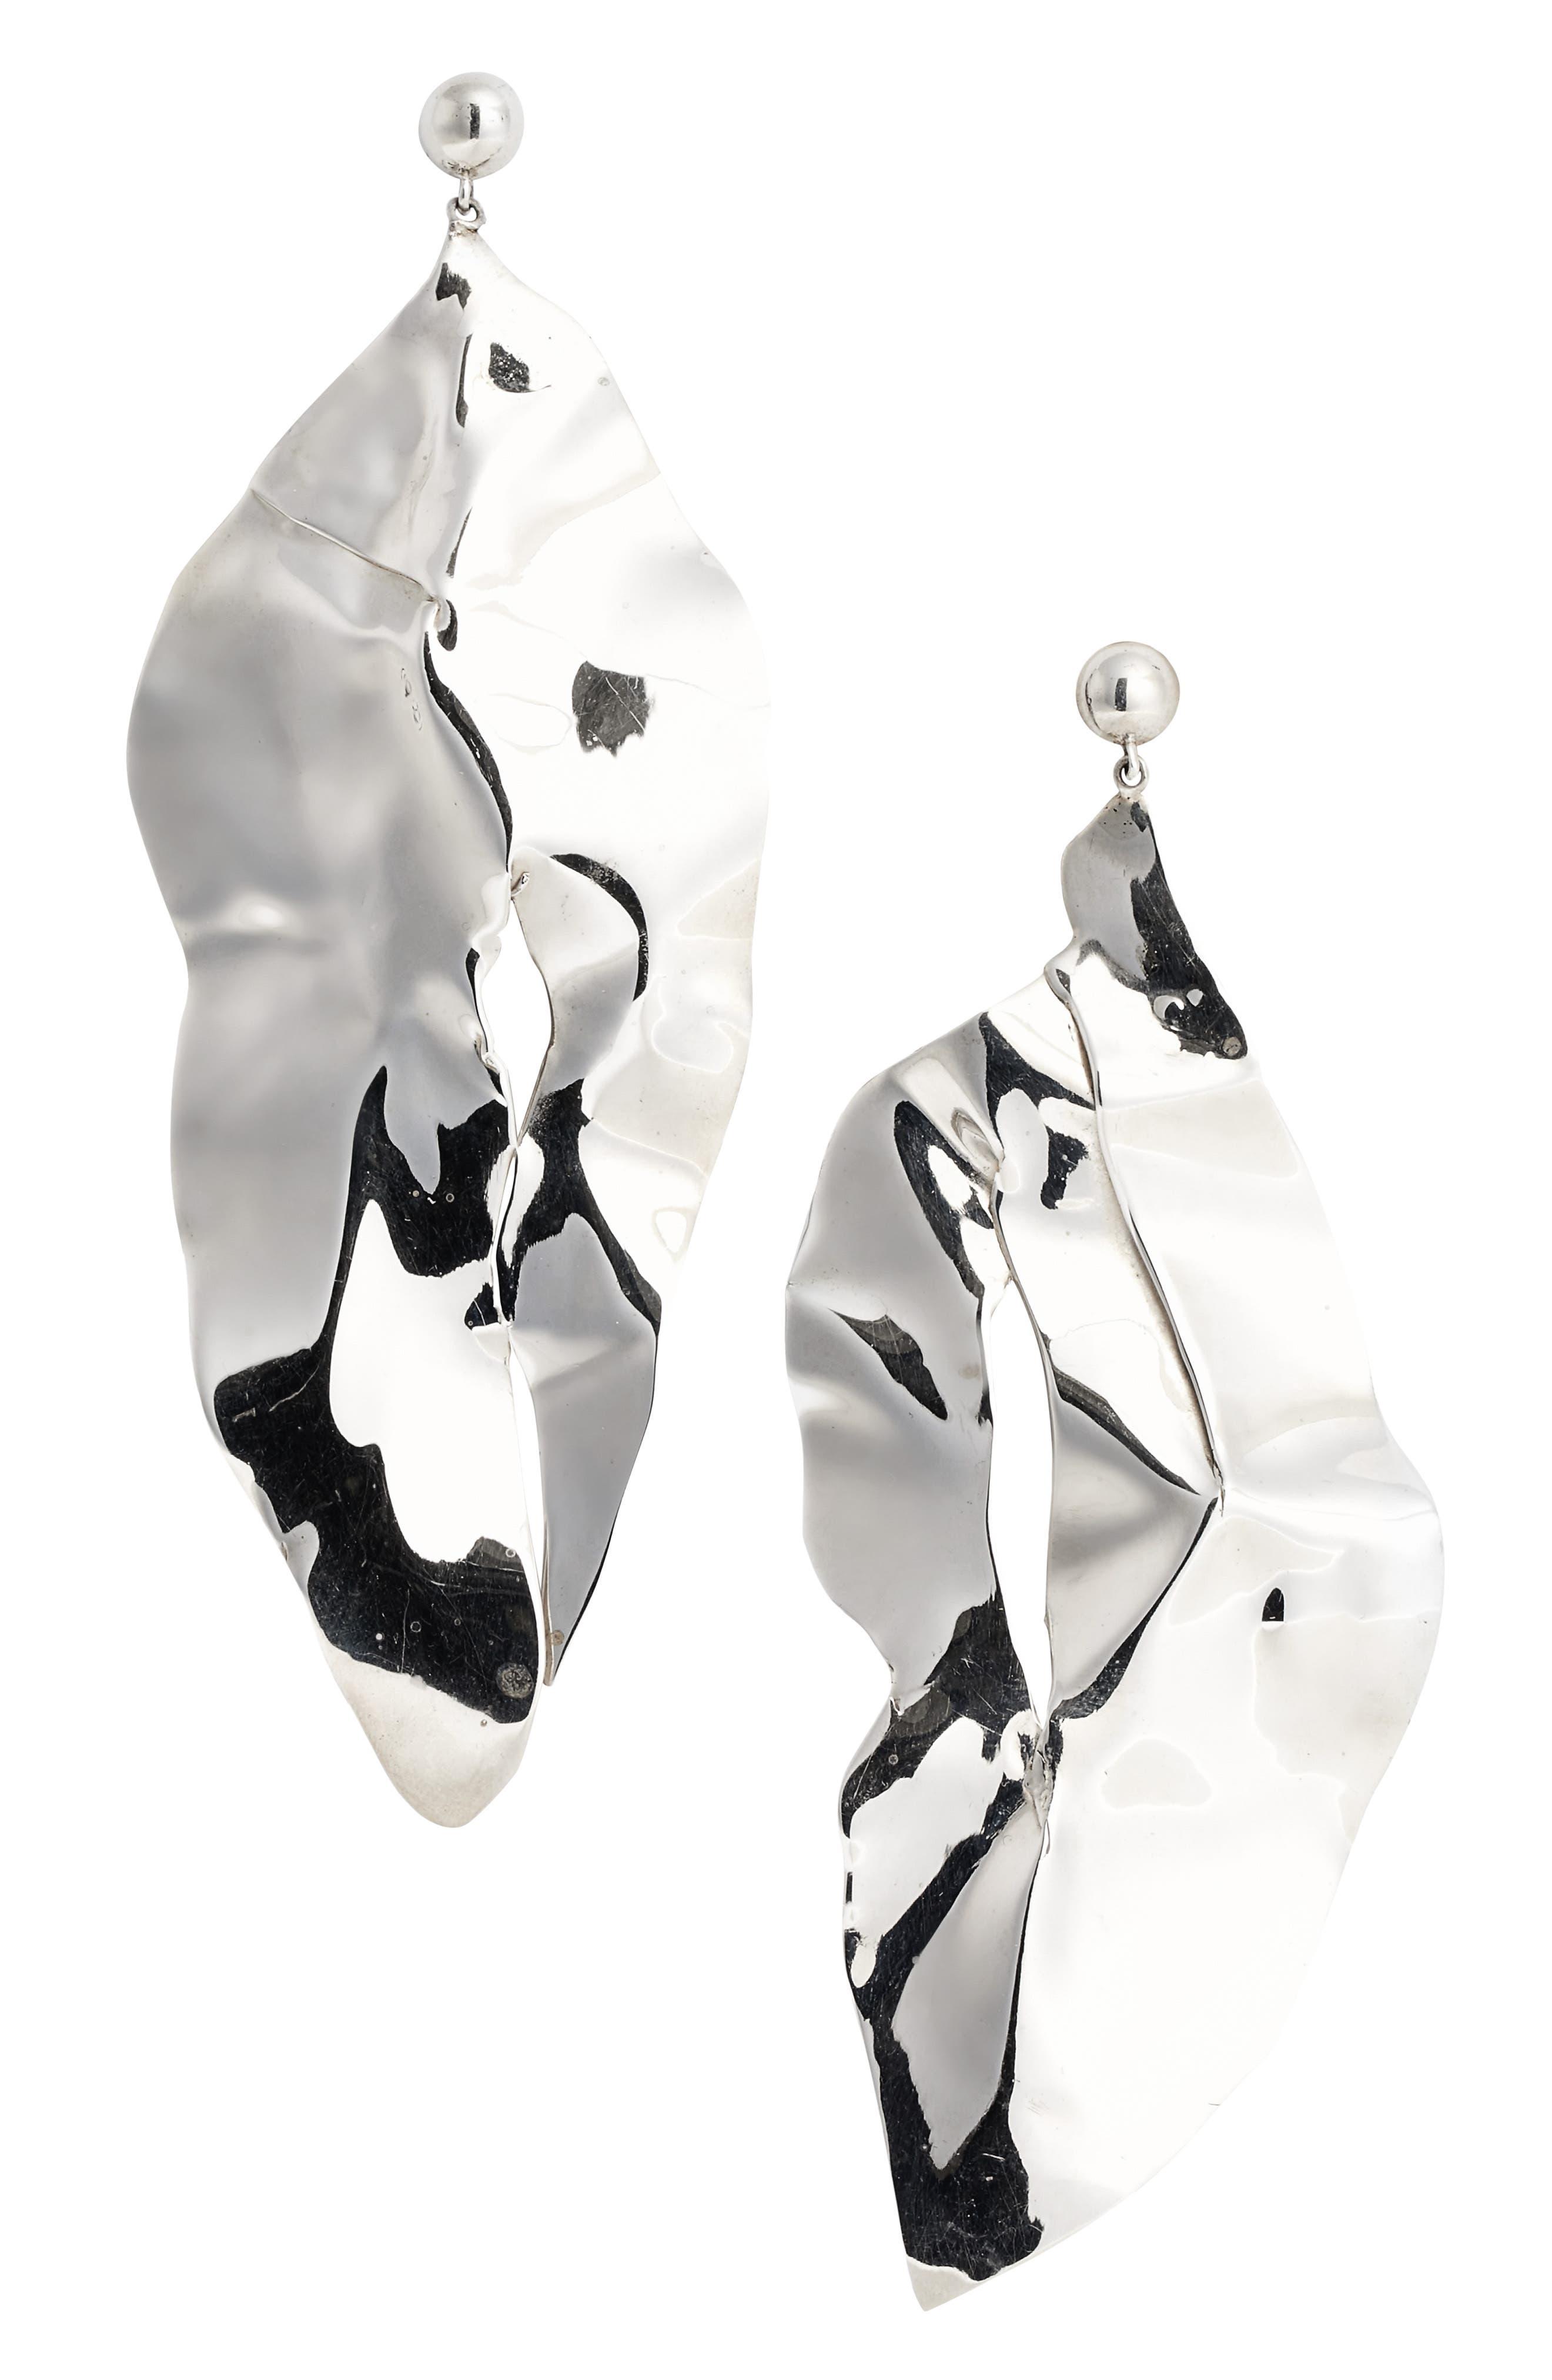 Wilke Drop Earrings,                             Main thumbnail 1, color,                             040